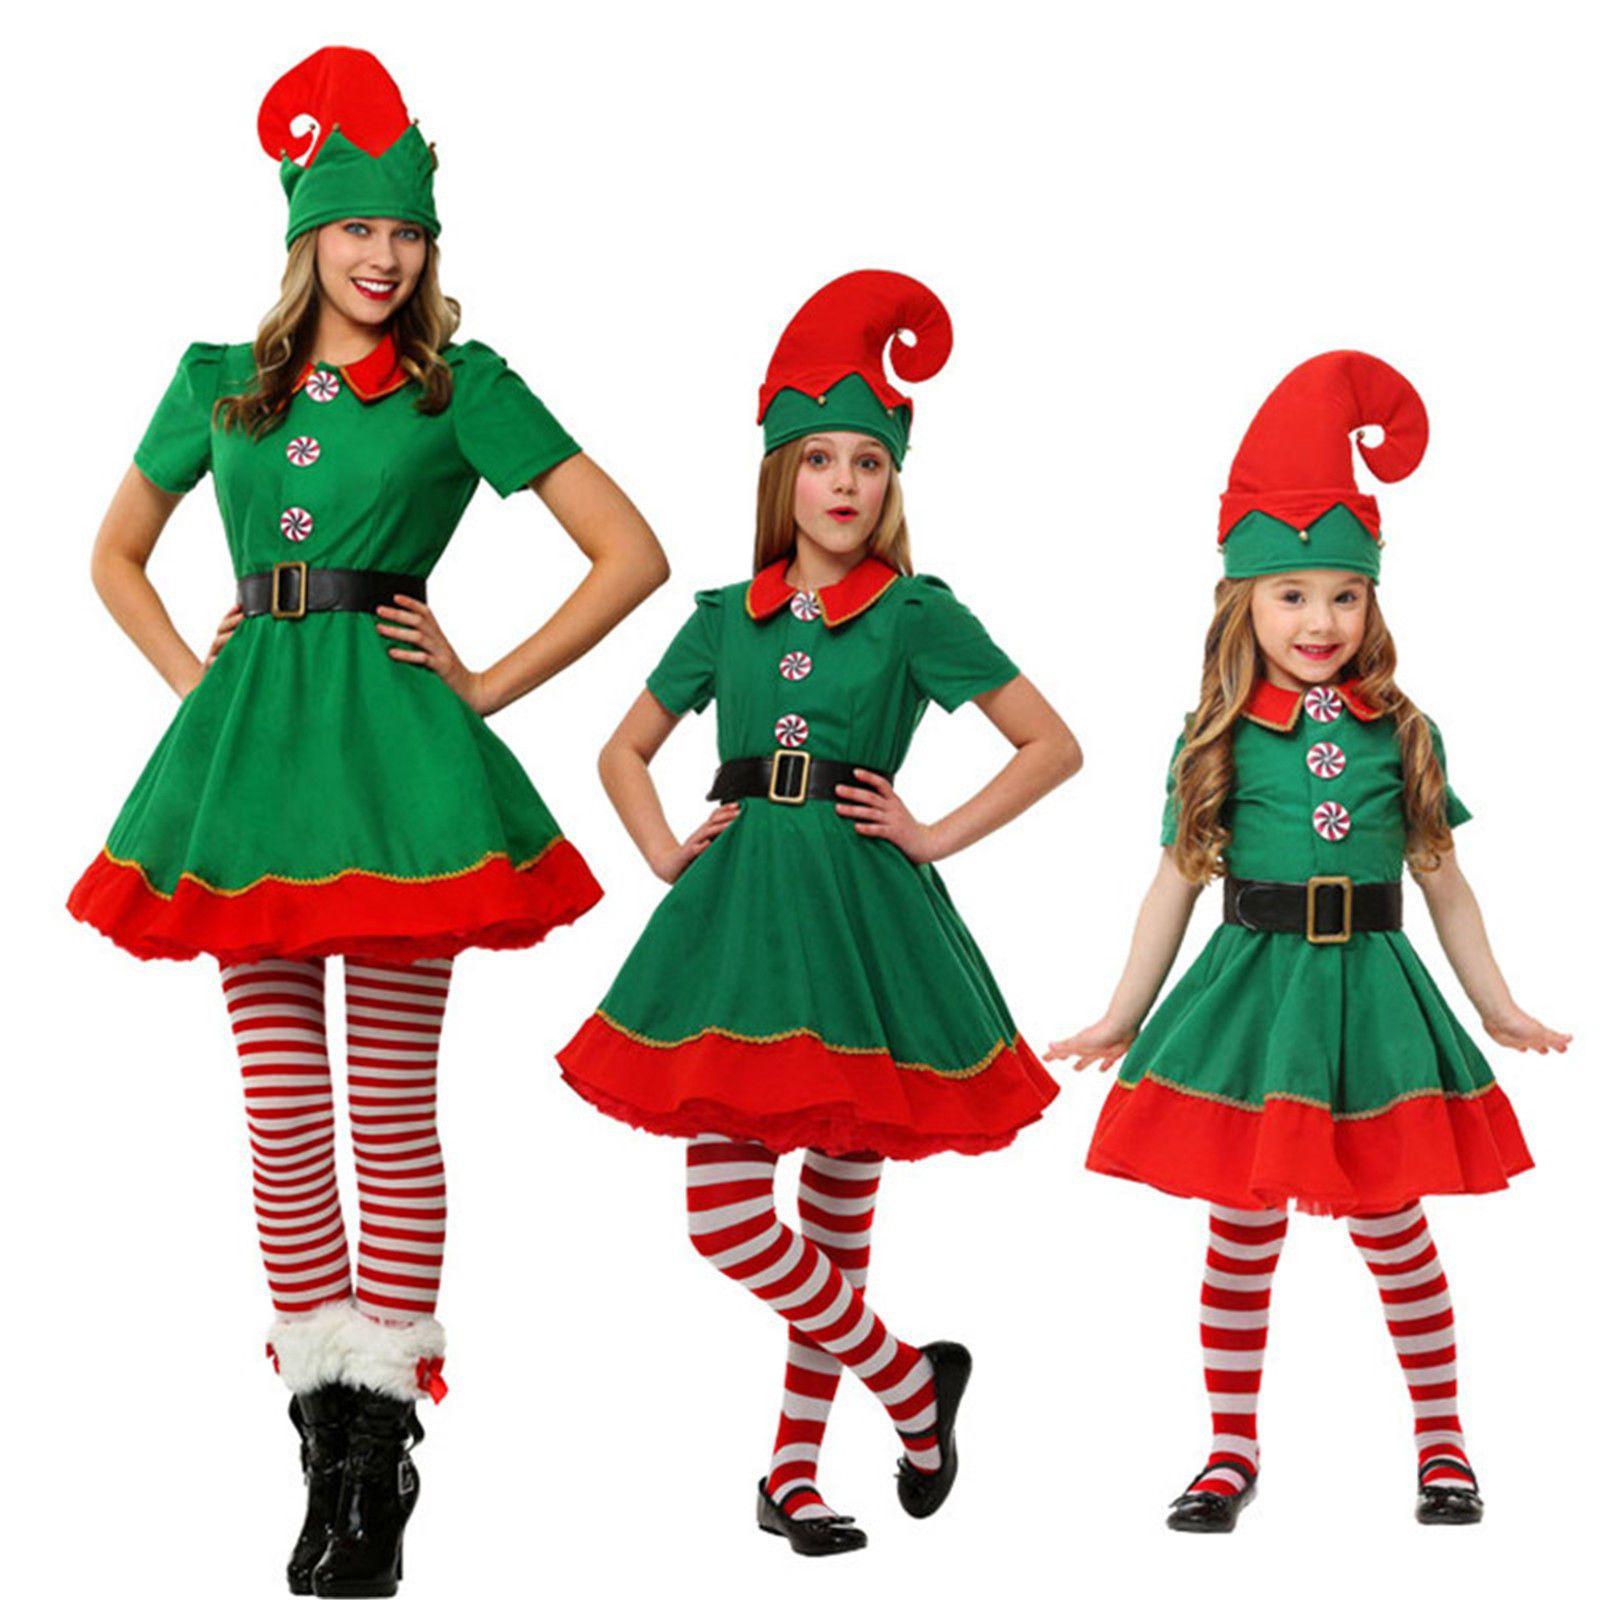 Girls Elf Tights Red and Green Santa Little Helper Christmas Fancy Dress Kids